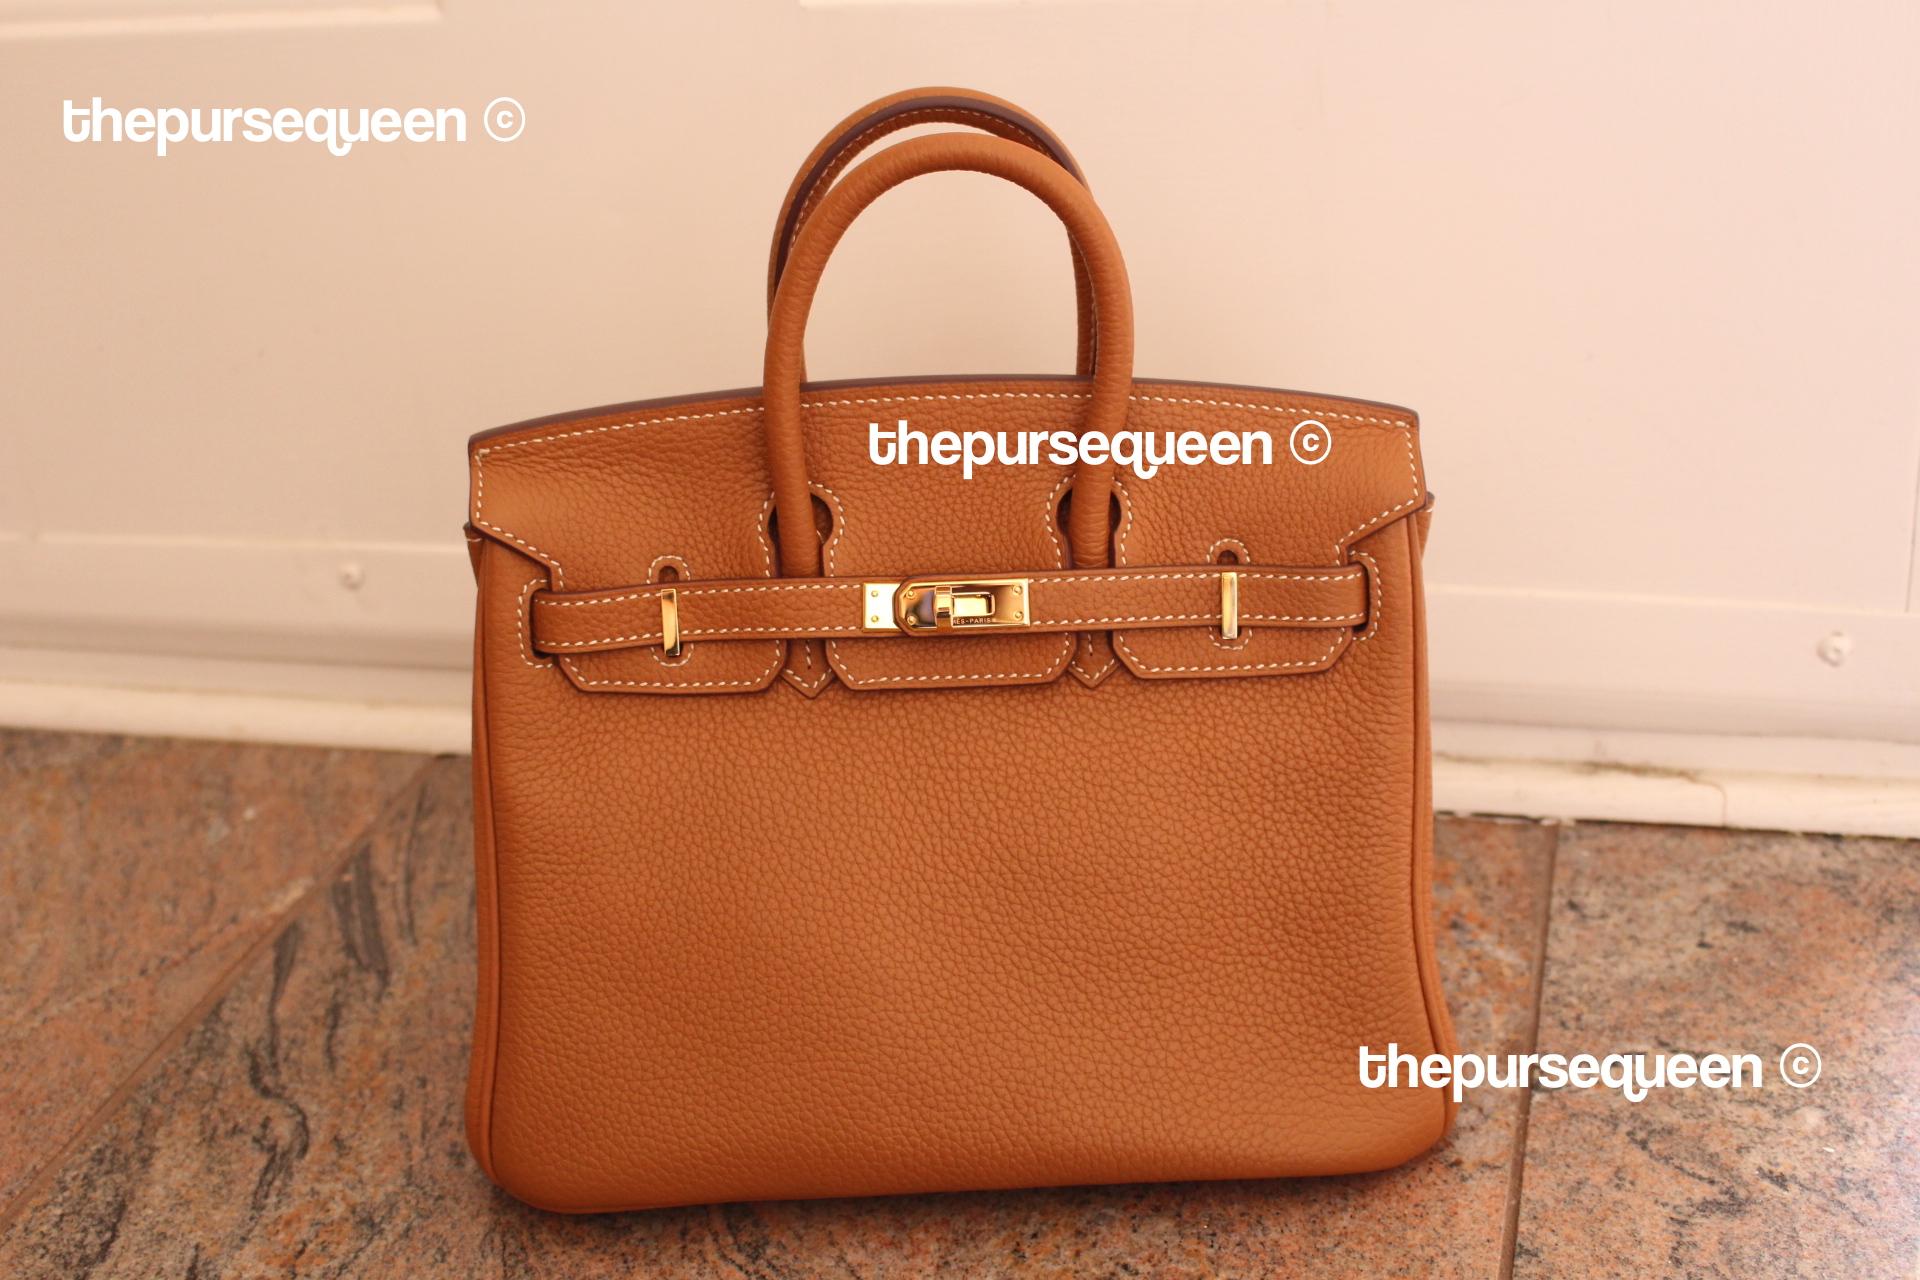 Fake Hermes Bag